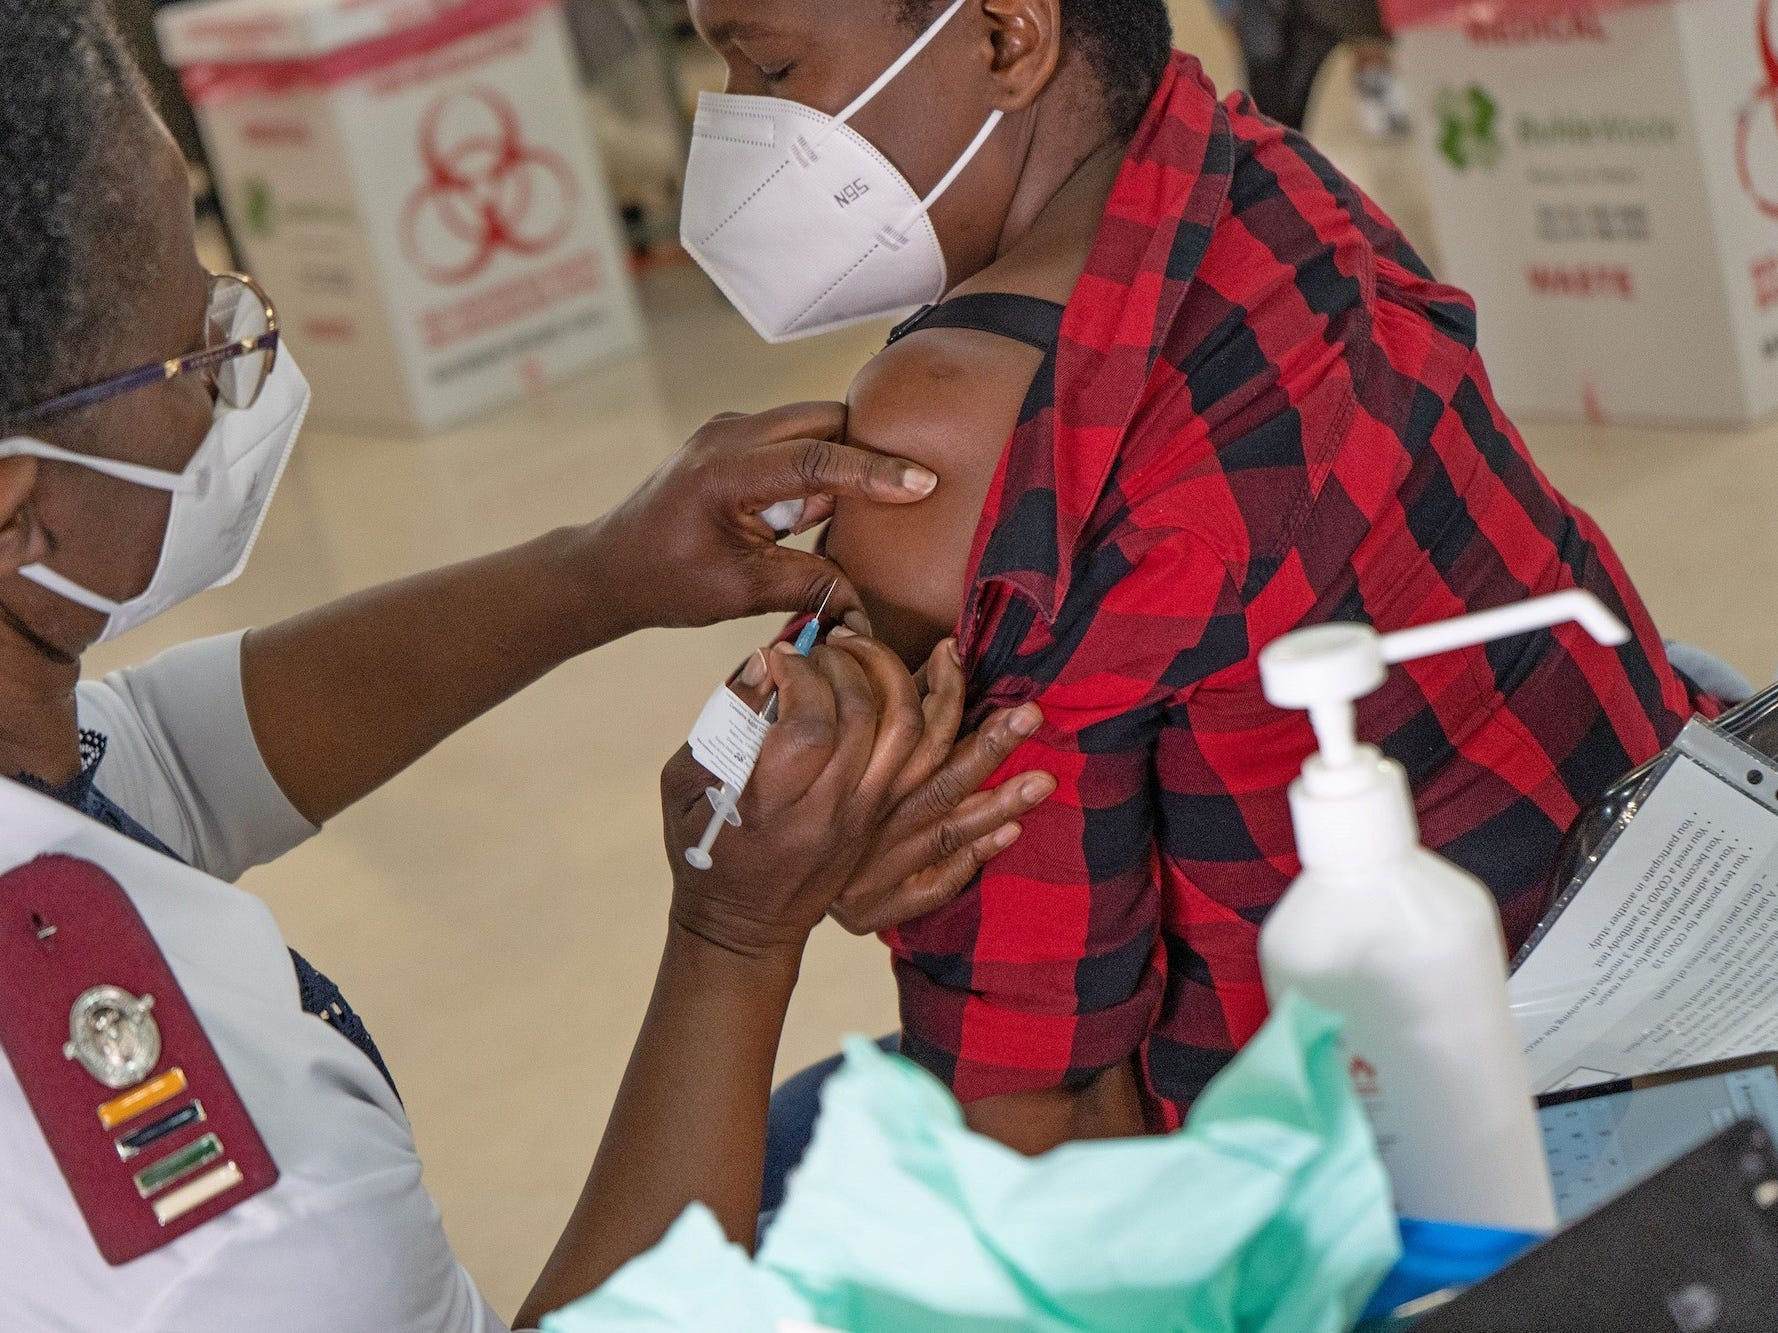 Woman carried coronavirus for 216 days